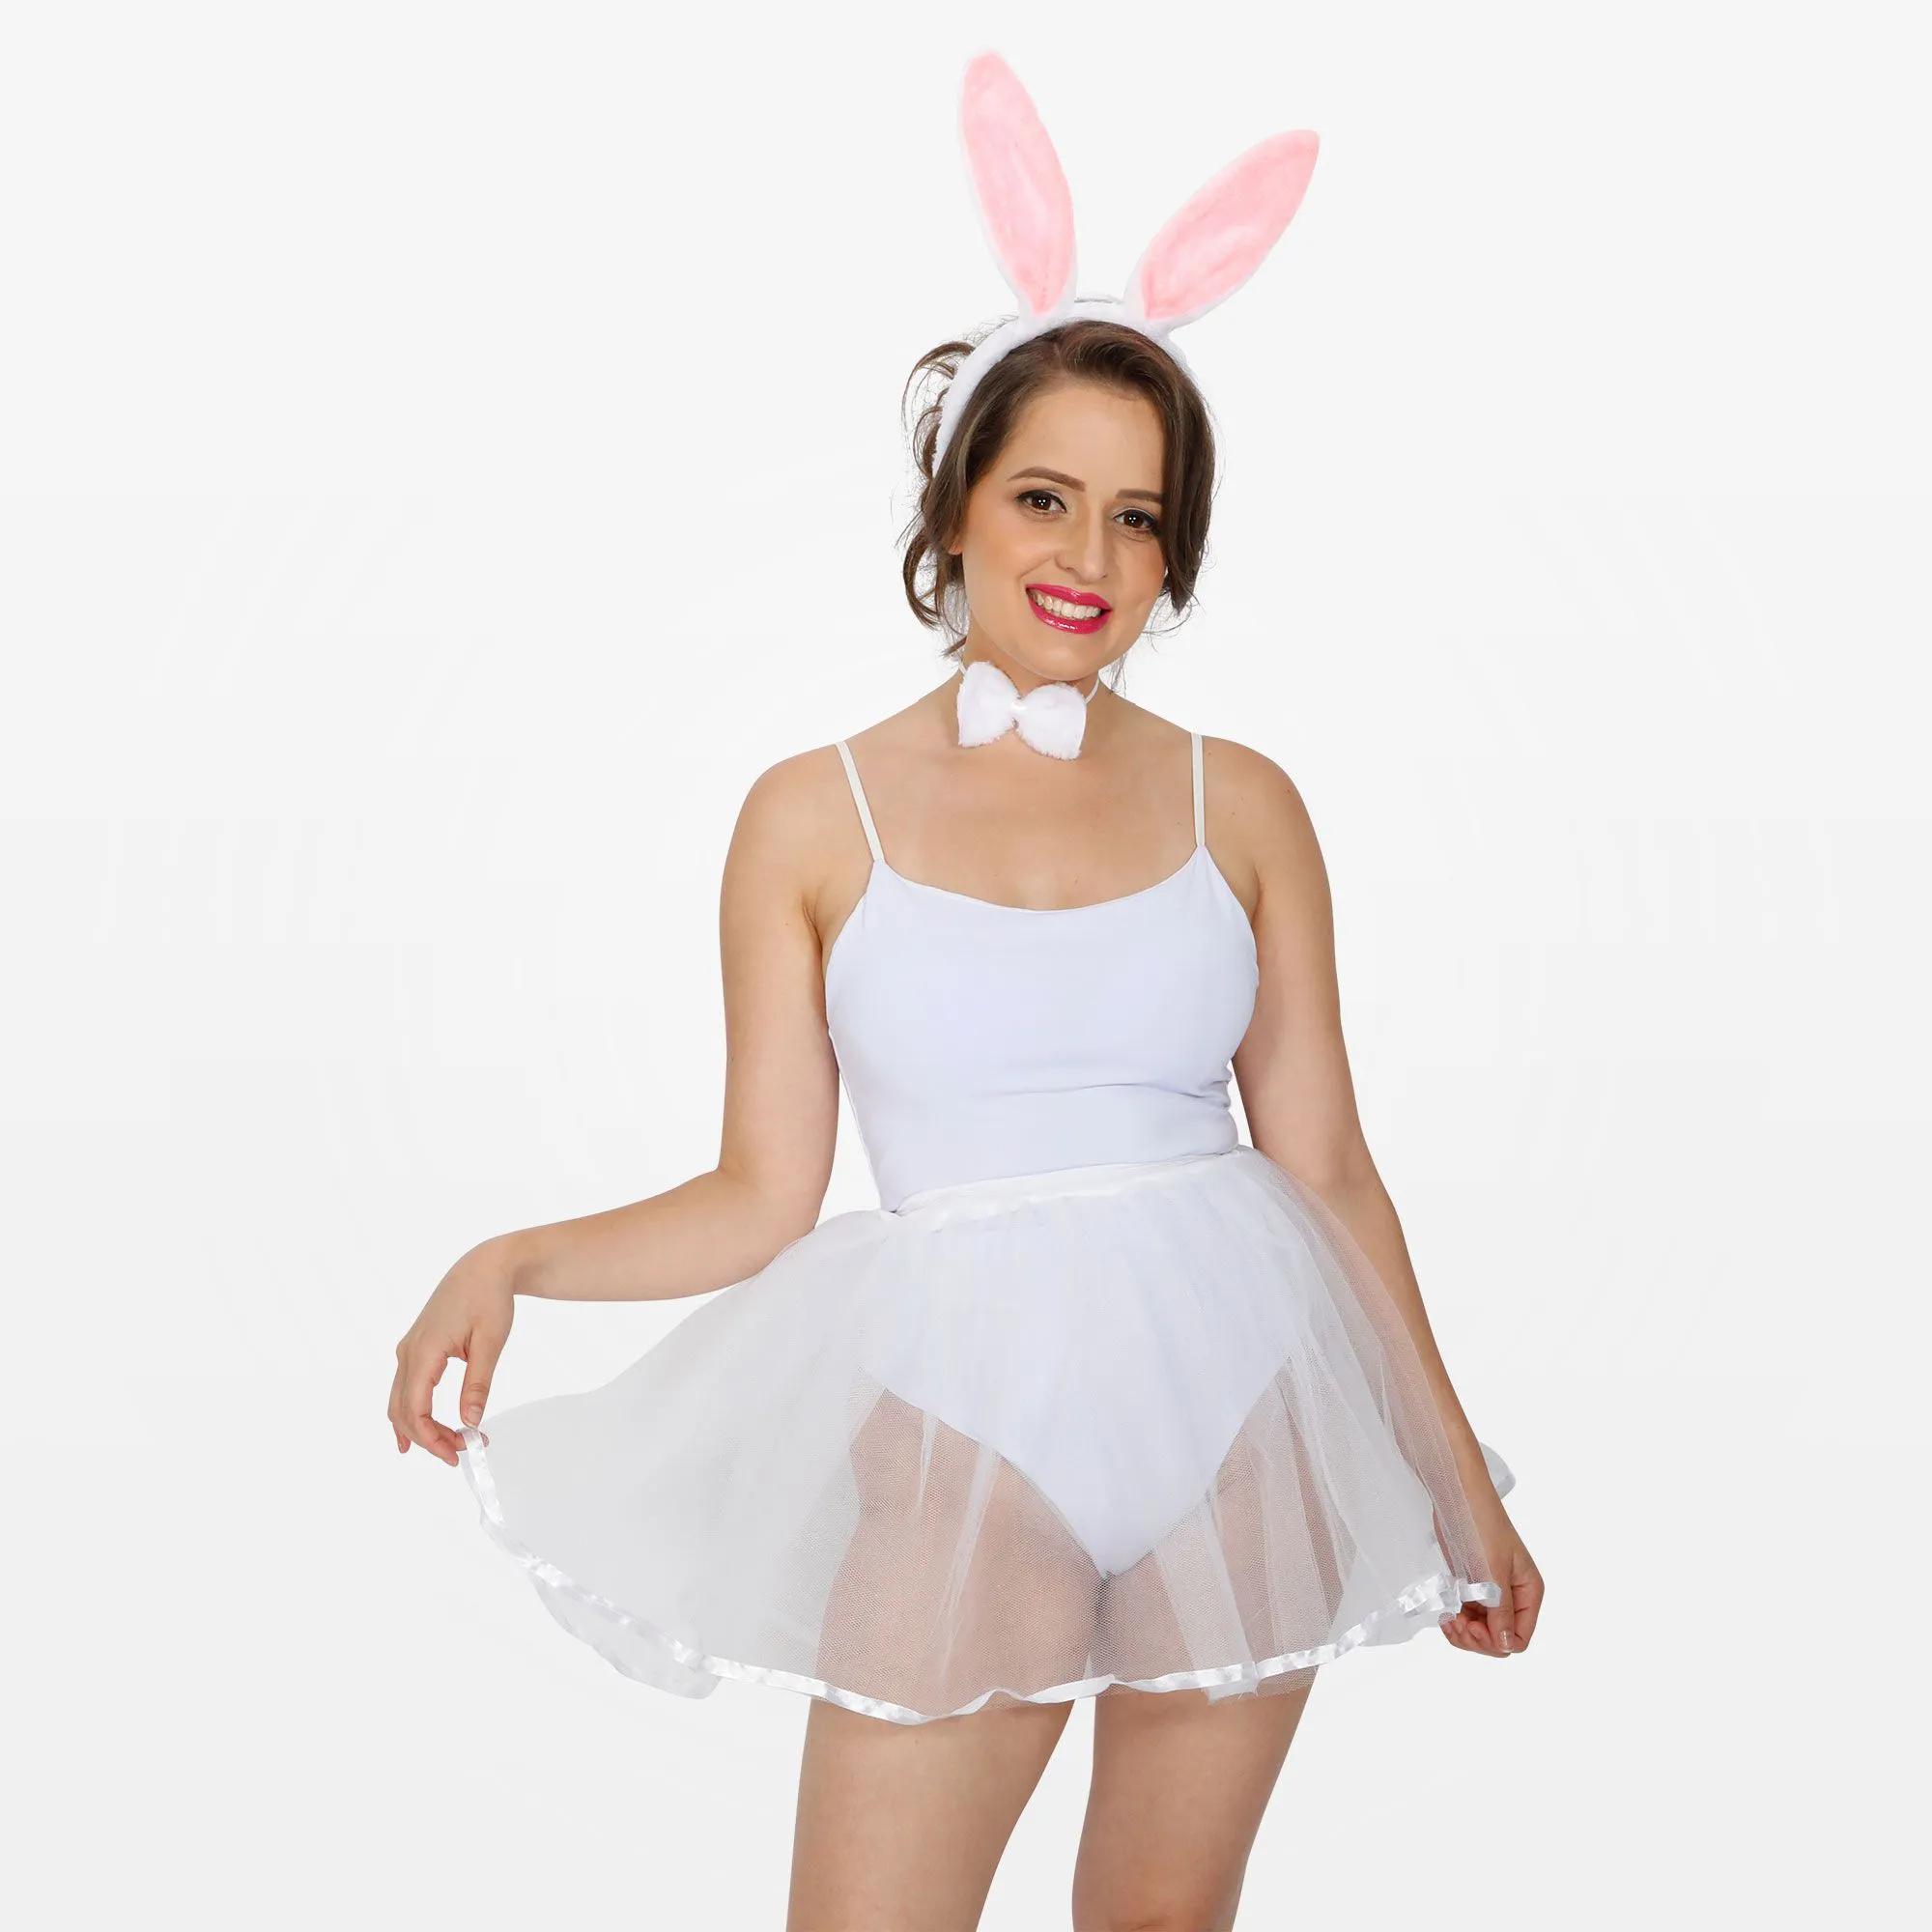 Fantasia Coelhinha com Body Branco, Tiara e Saia Adulto